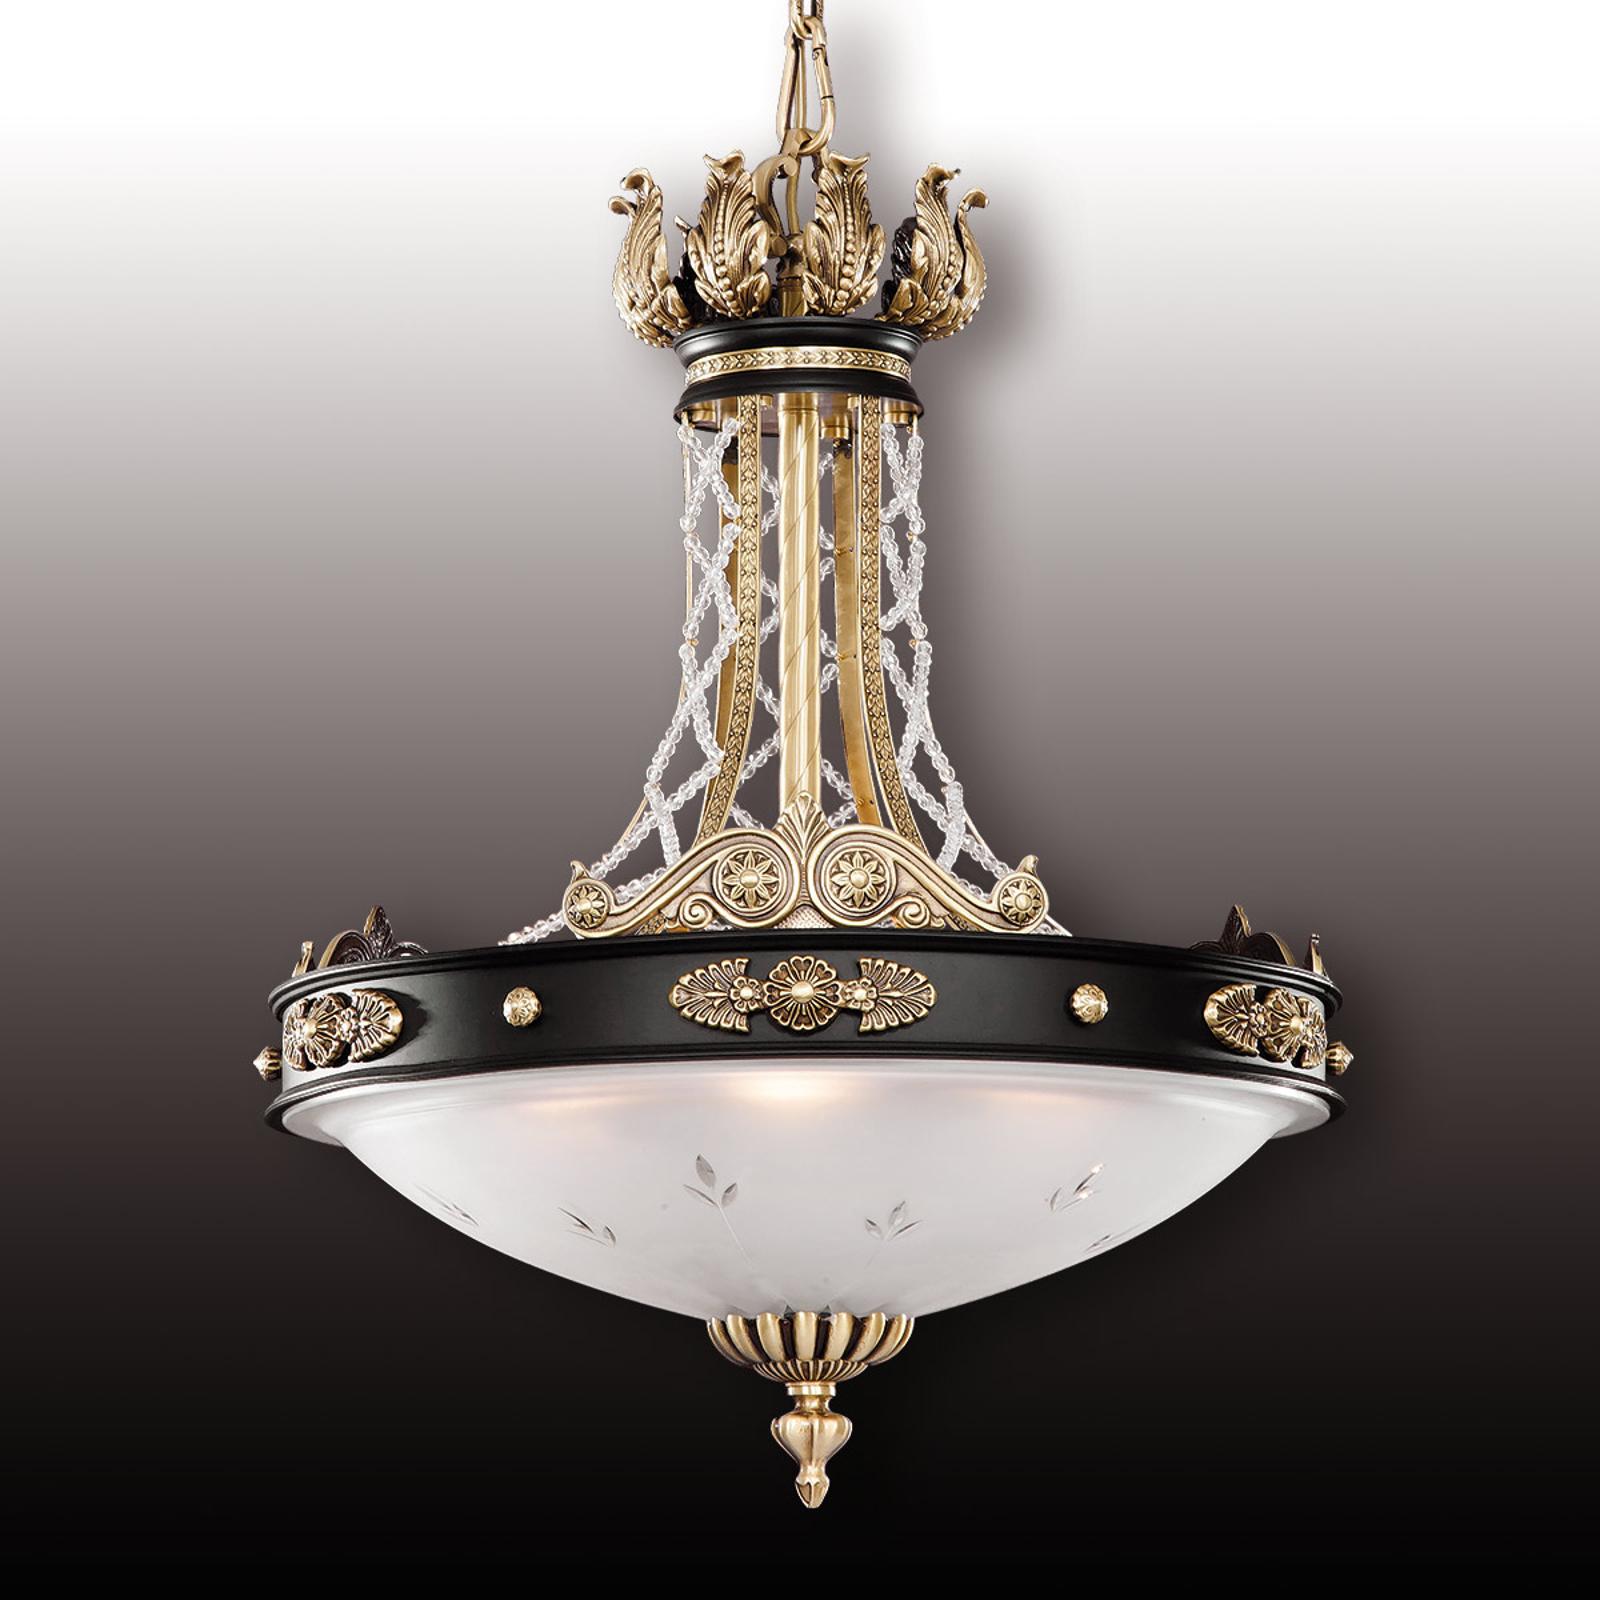 Tudor pendellamp m. Asfour kristal